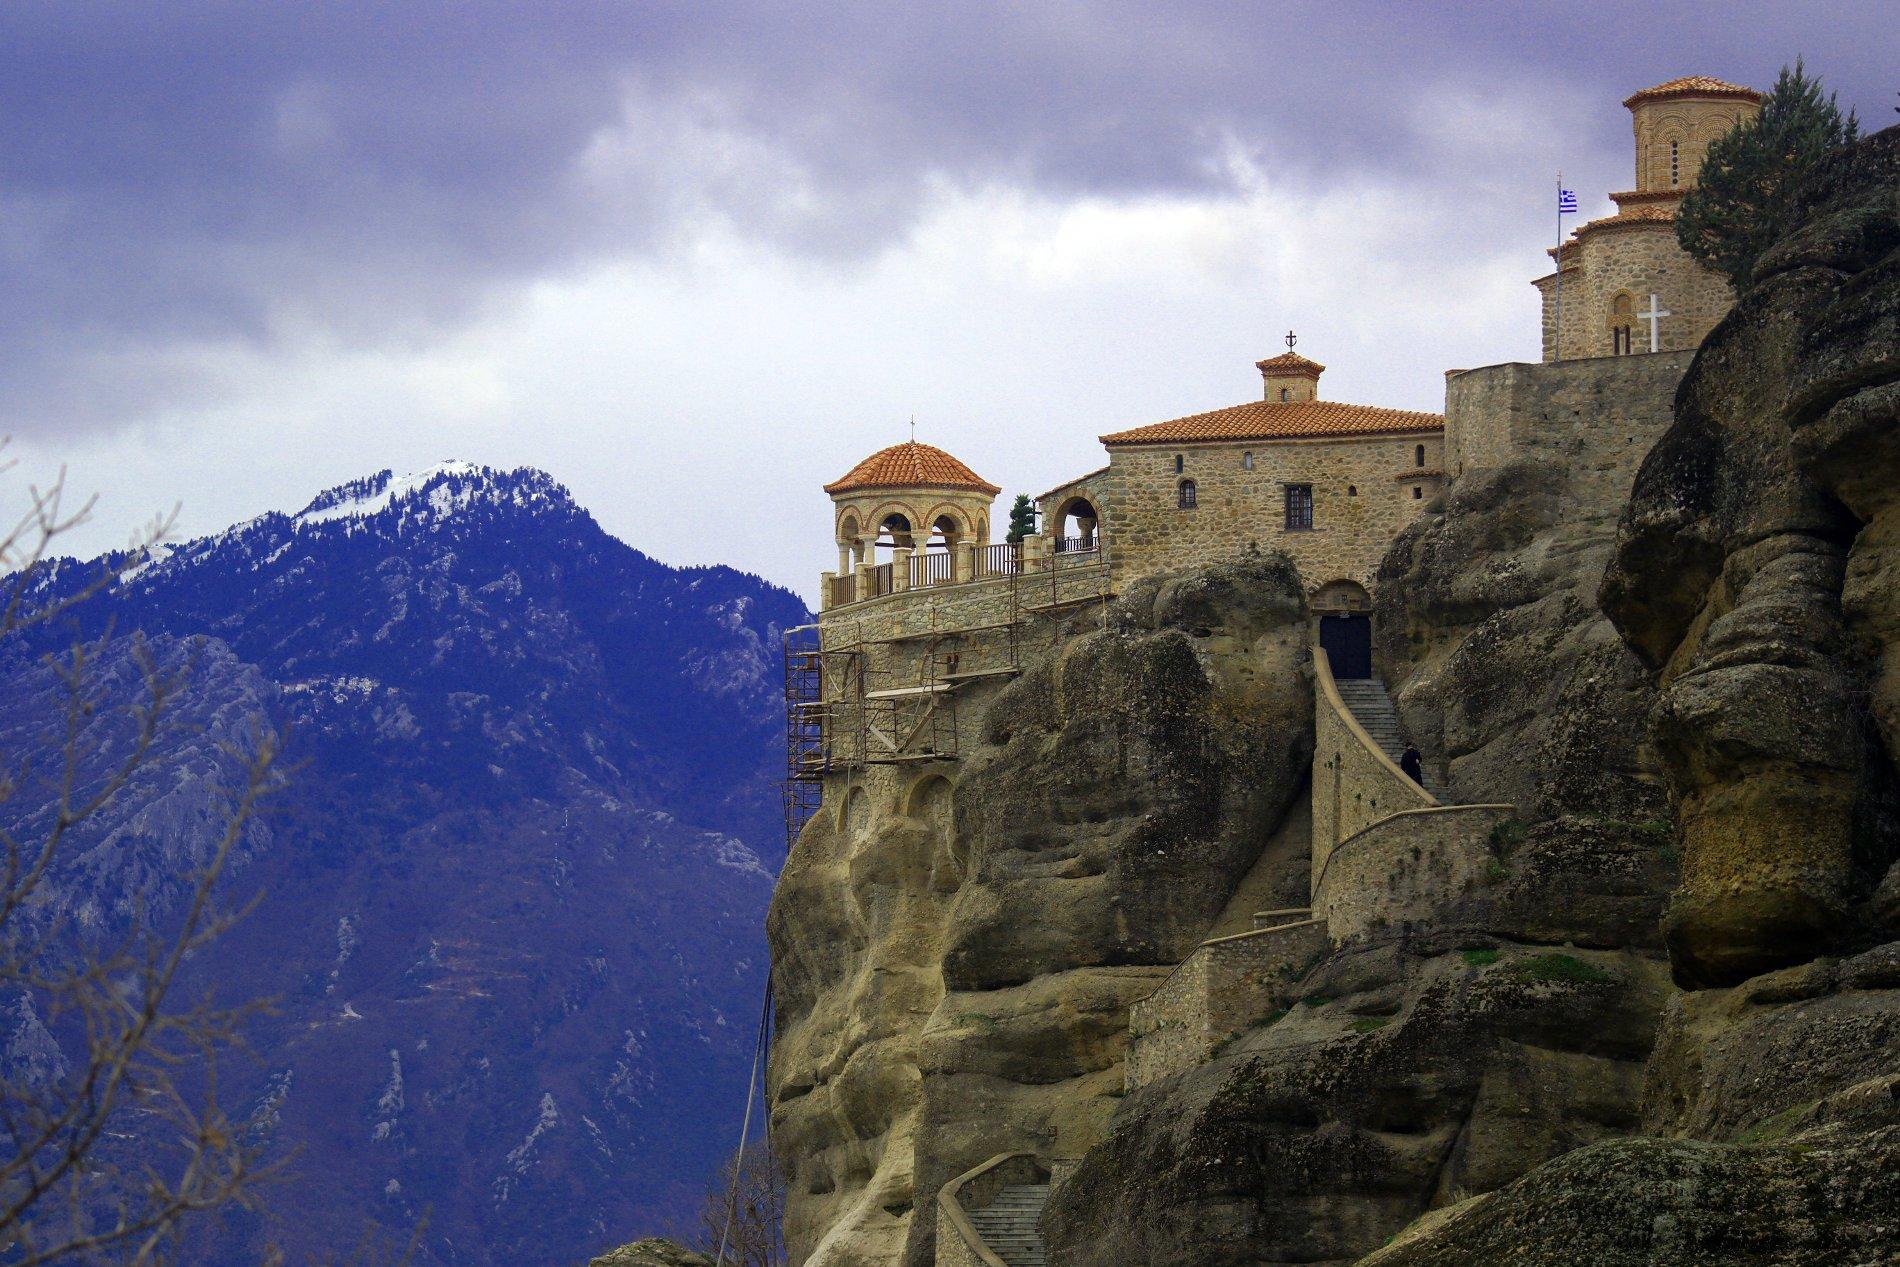 The Meteora monasteries on top of rock towers. Source: Truevoyagers